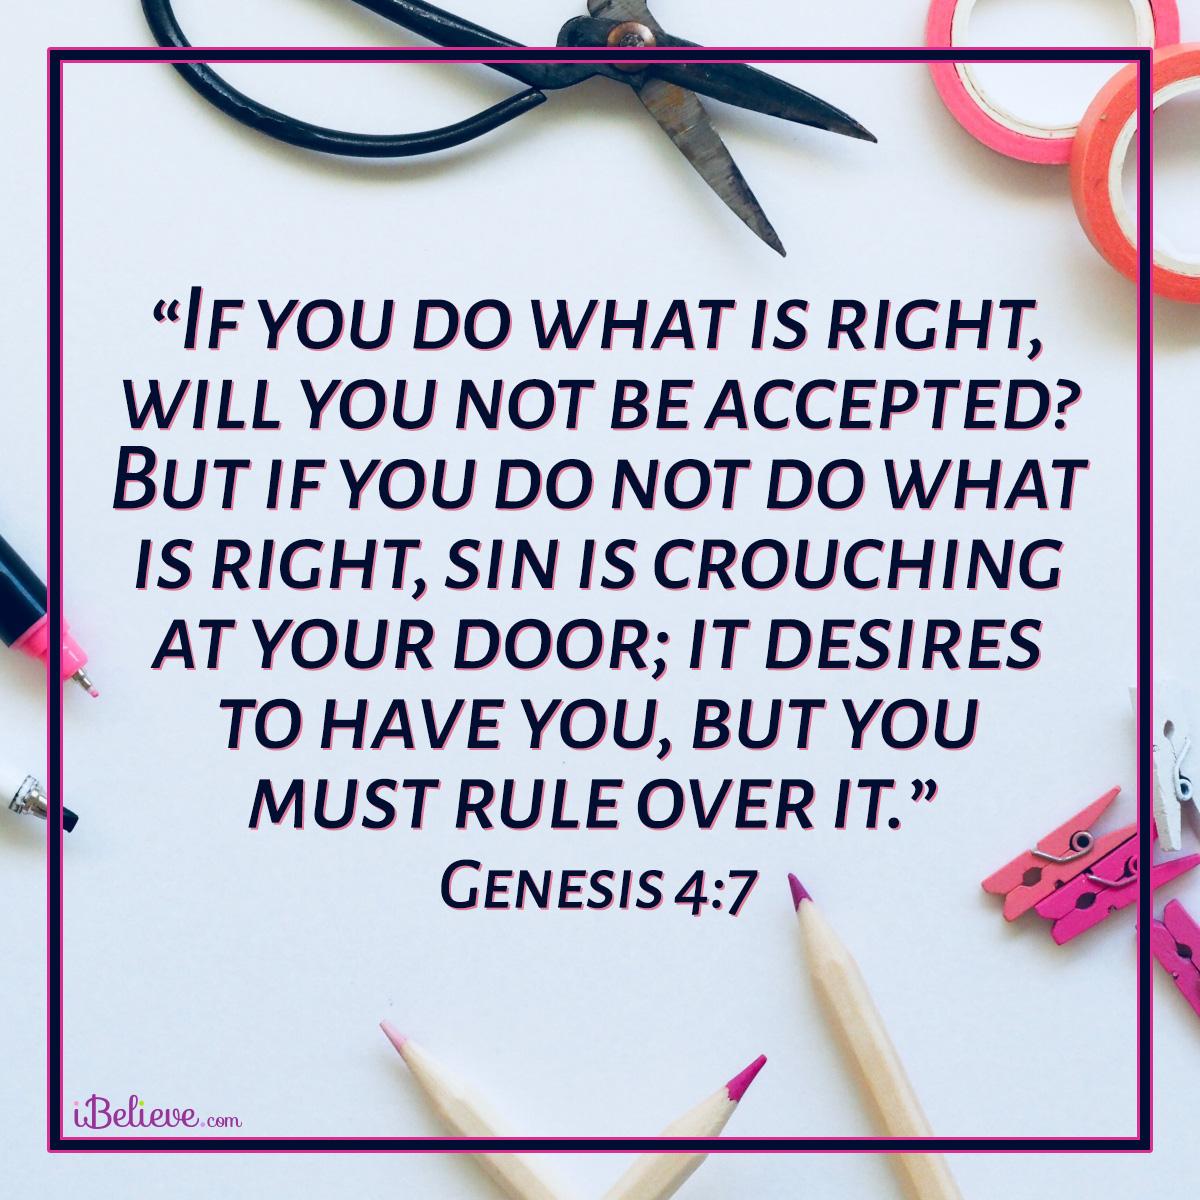 Genesis 4:7, inspirational image